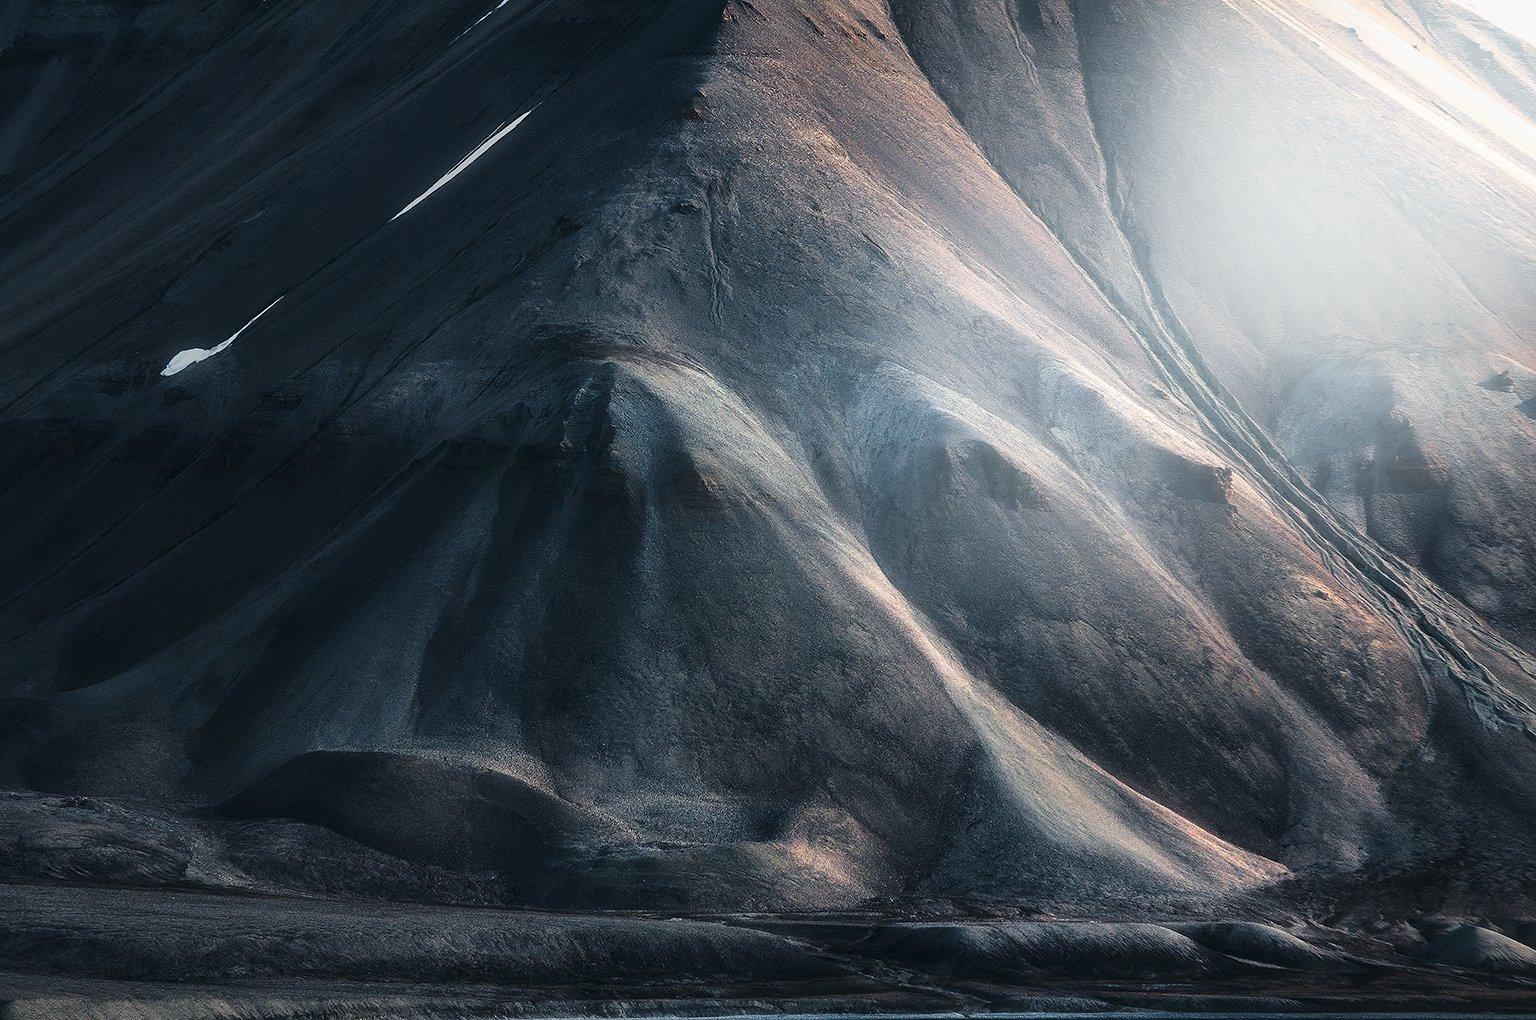 svalbard, spitsbergen, northnorway, islands, polar, arctic, summer, prometheus, alien, planet, Csomai David